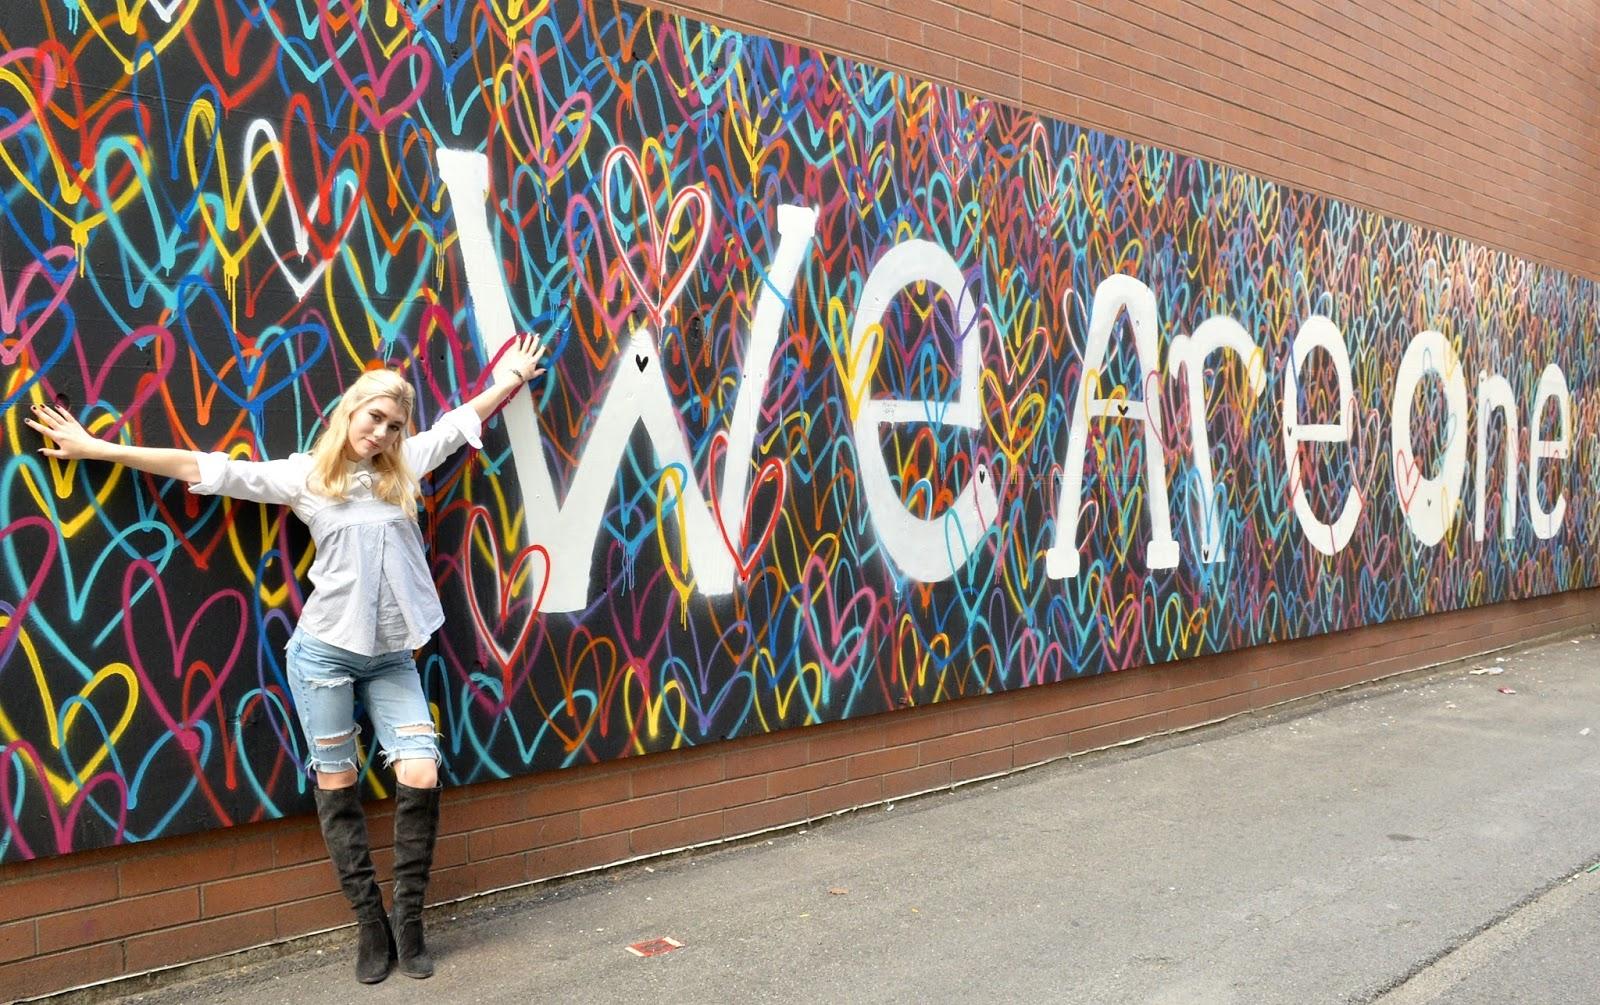 Hugging a bleeding heart mural in chicago.